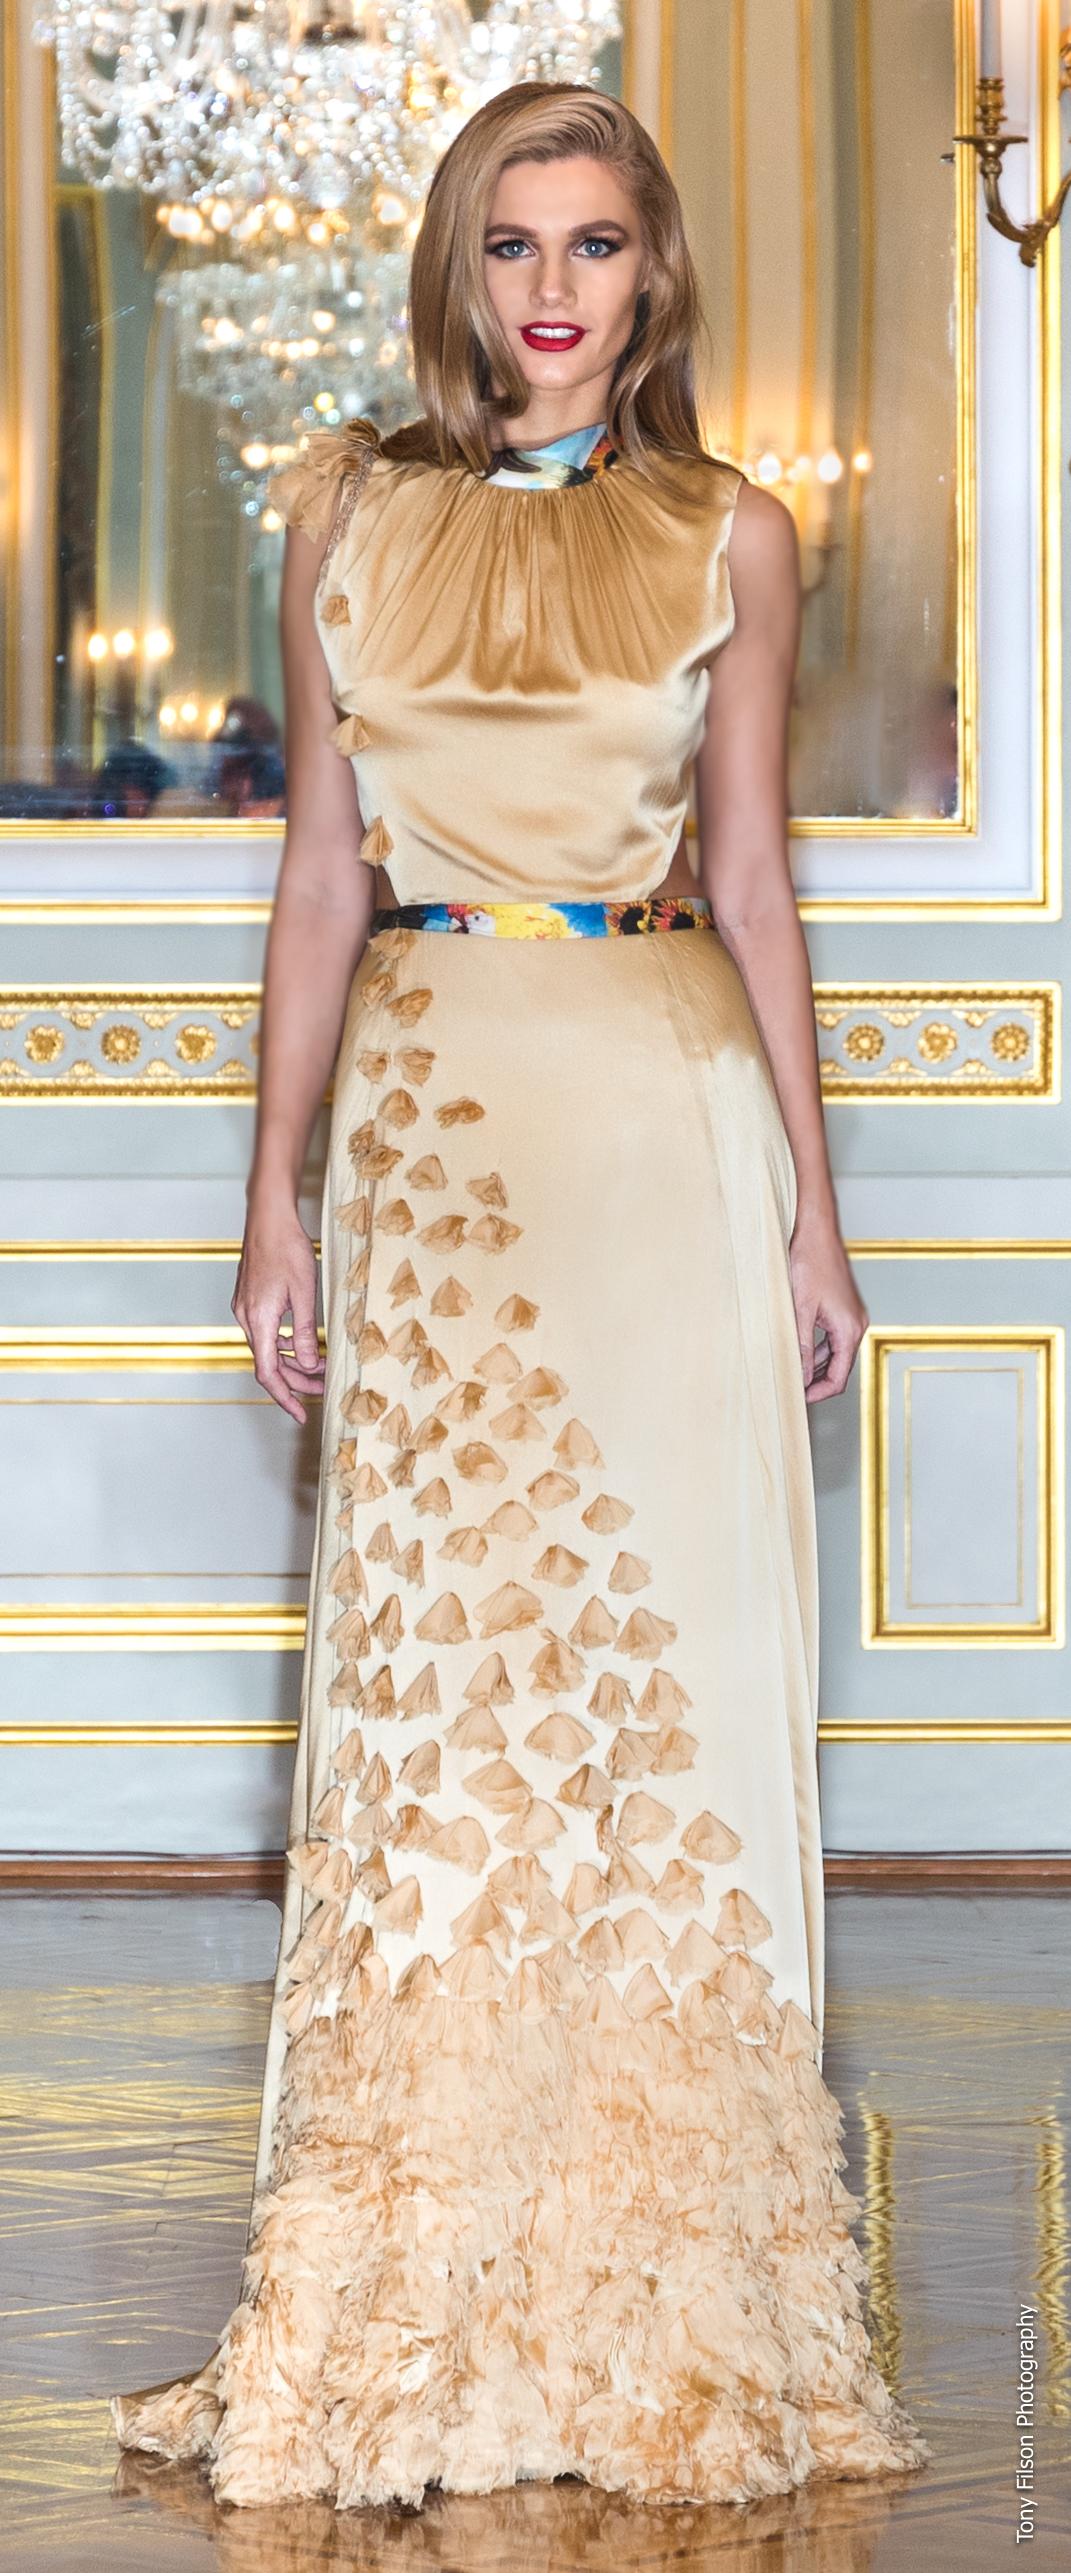 Natalia Eremenko Runway Fashion